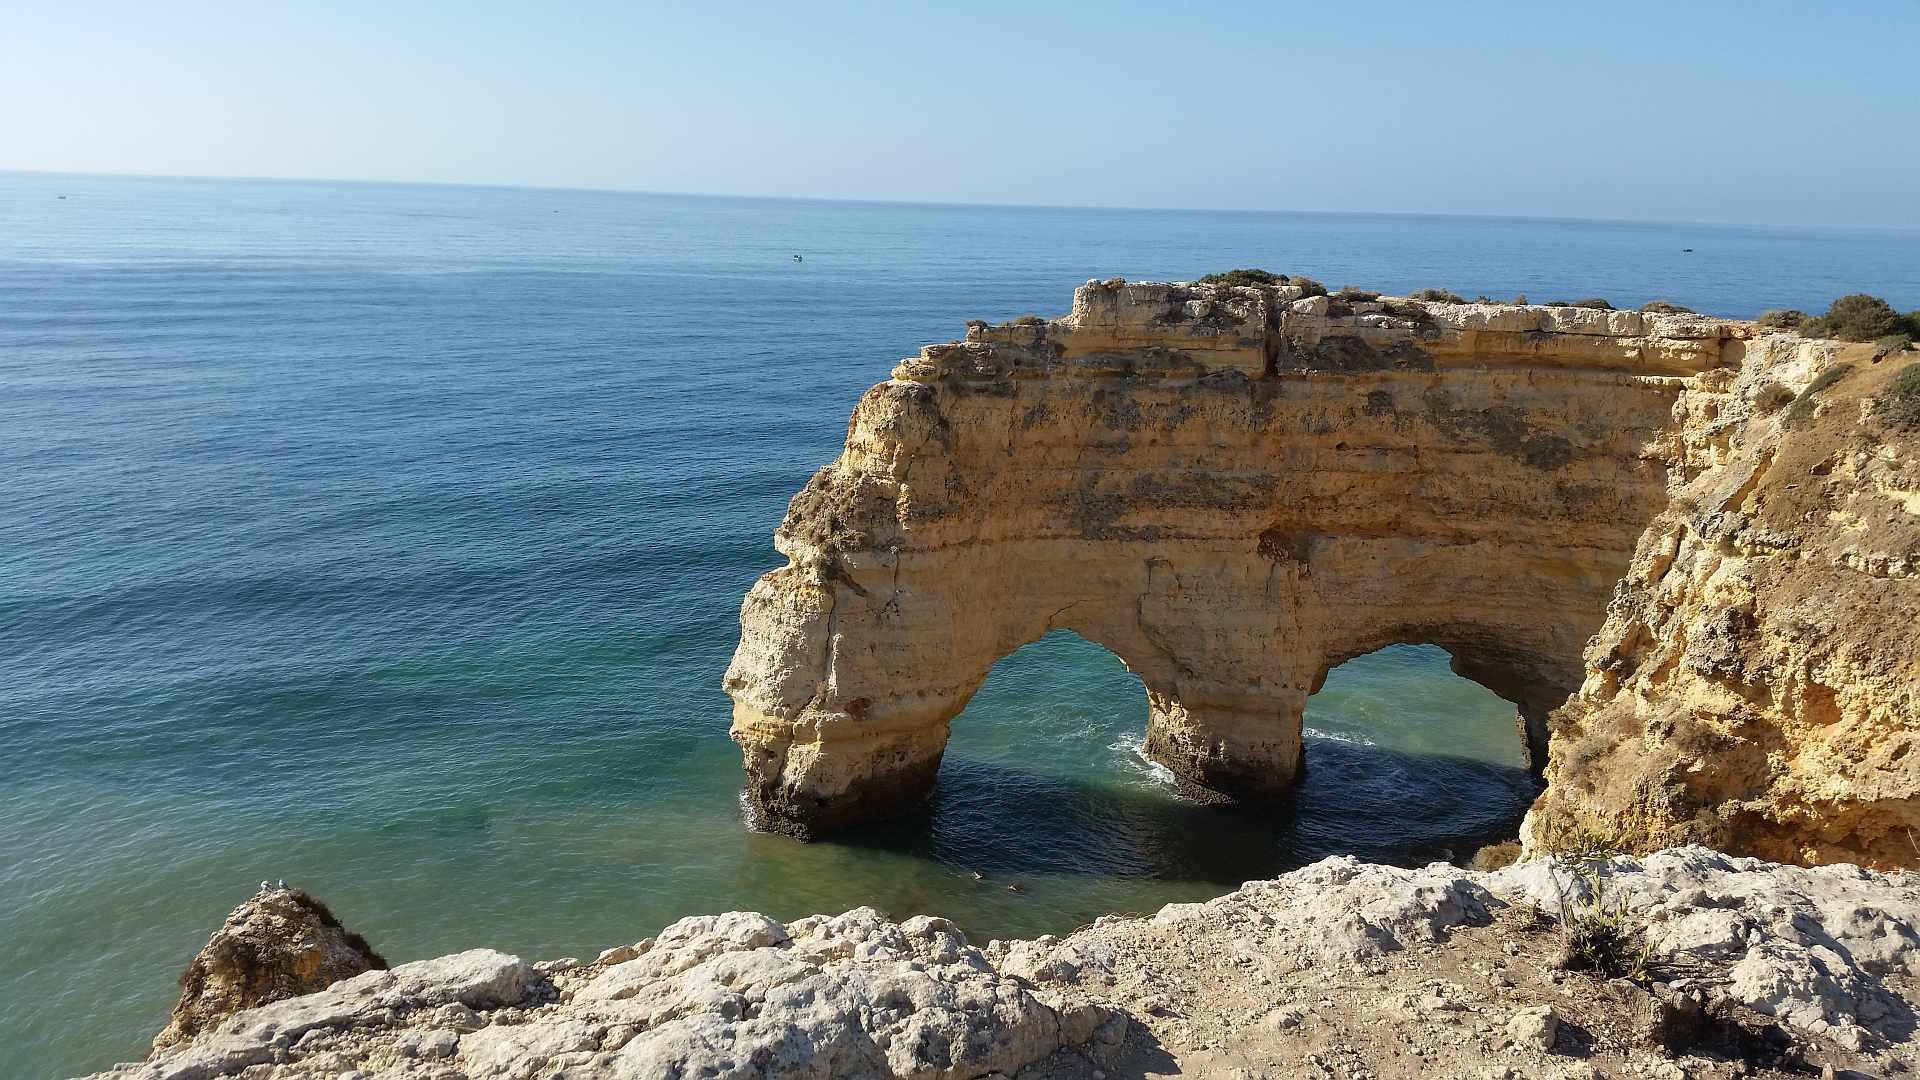 Lagao - Algarve view over the rocks and natural bridge